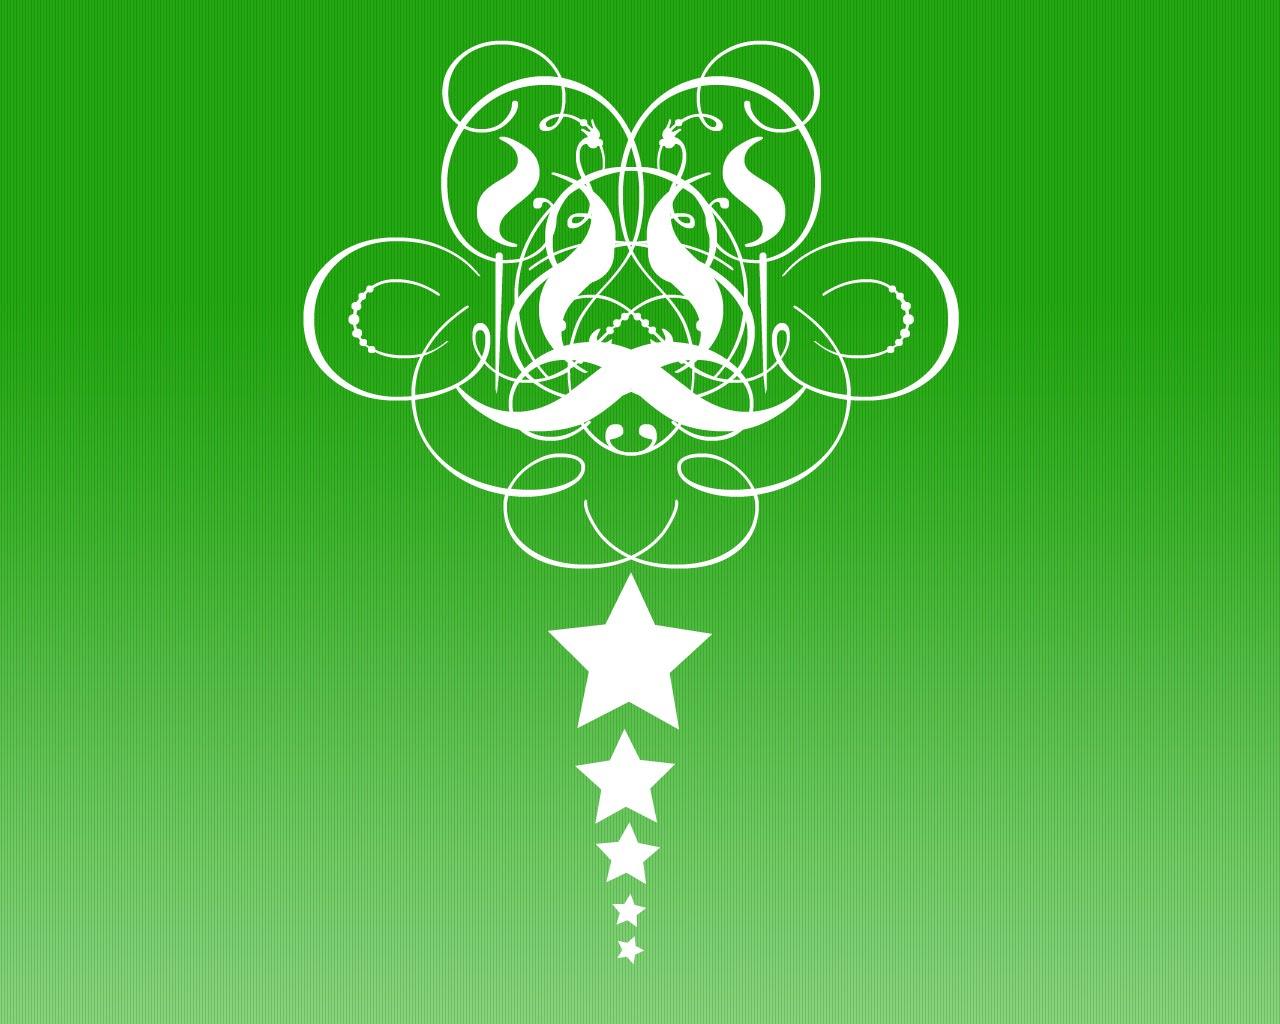 Super Green Coool Wallpapers Part 3